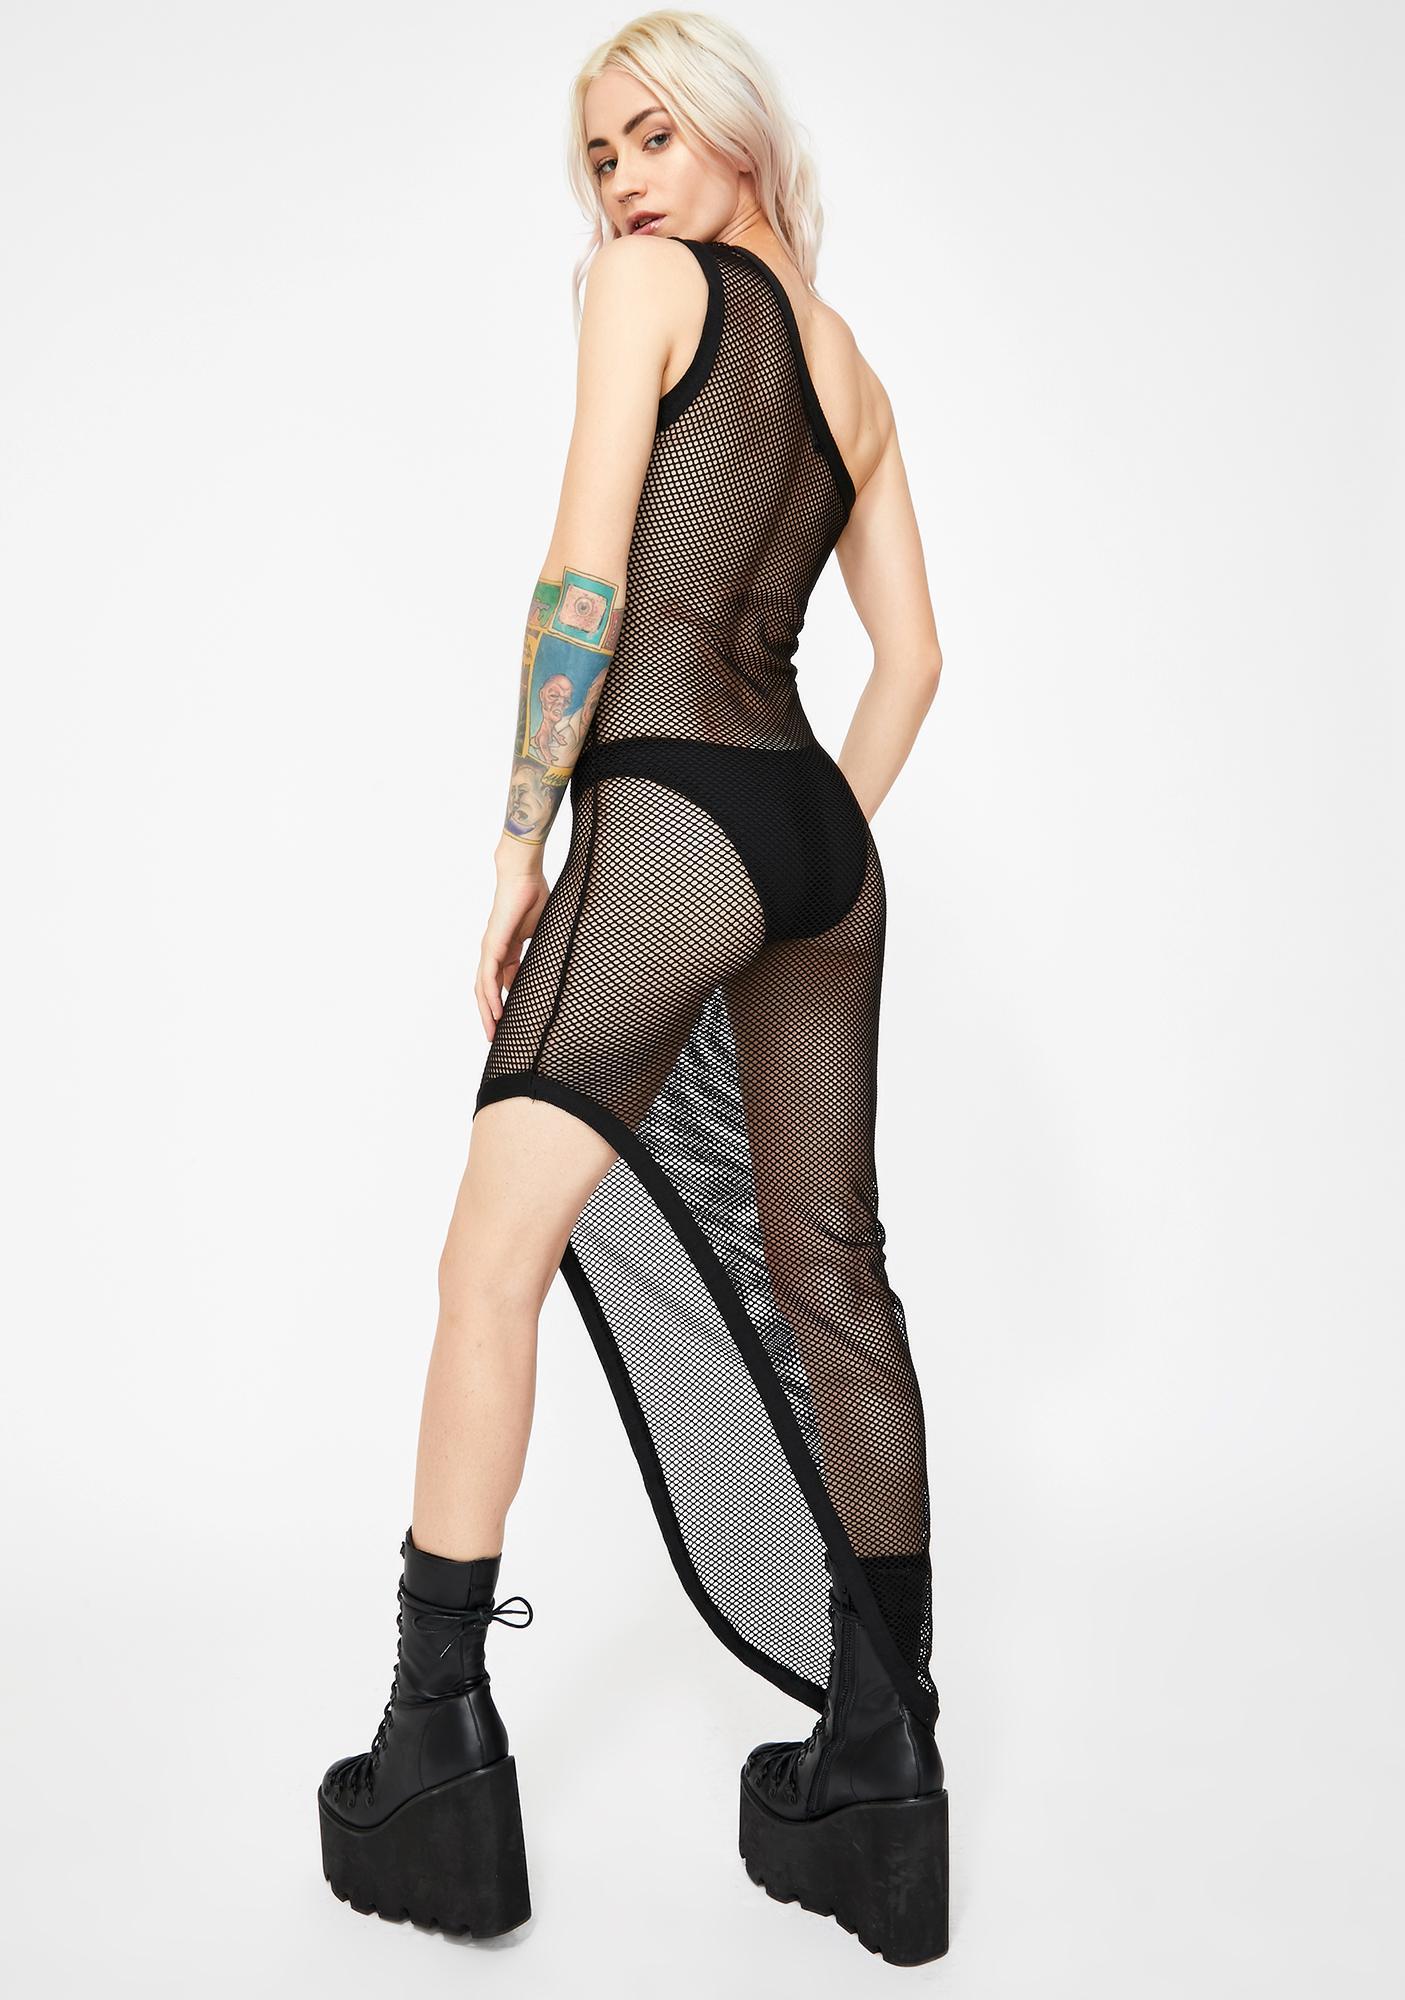 Kiki Riki No Apologies Sheer Dress